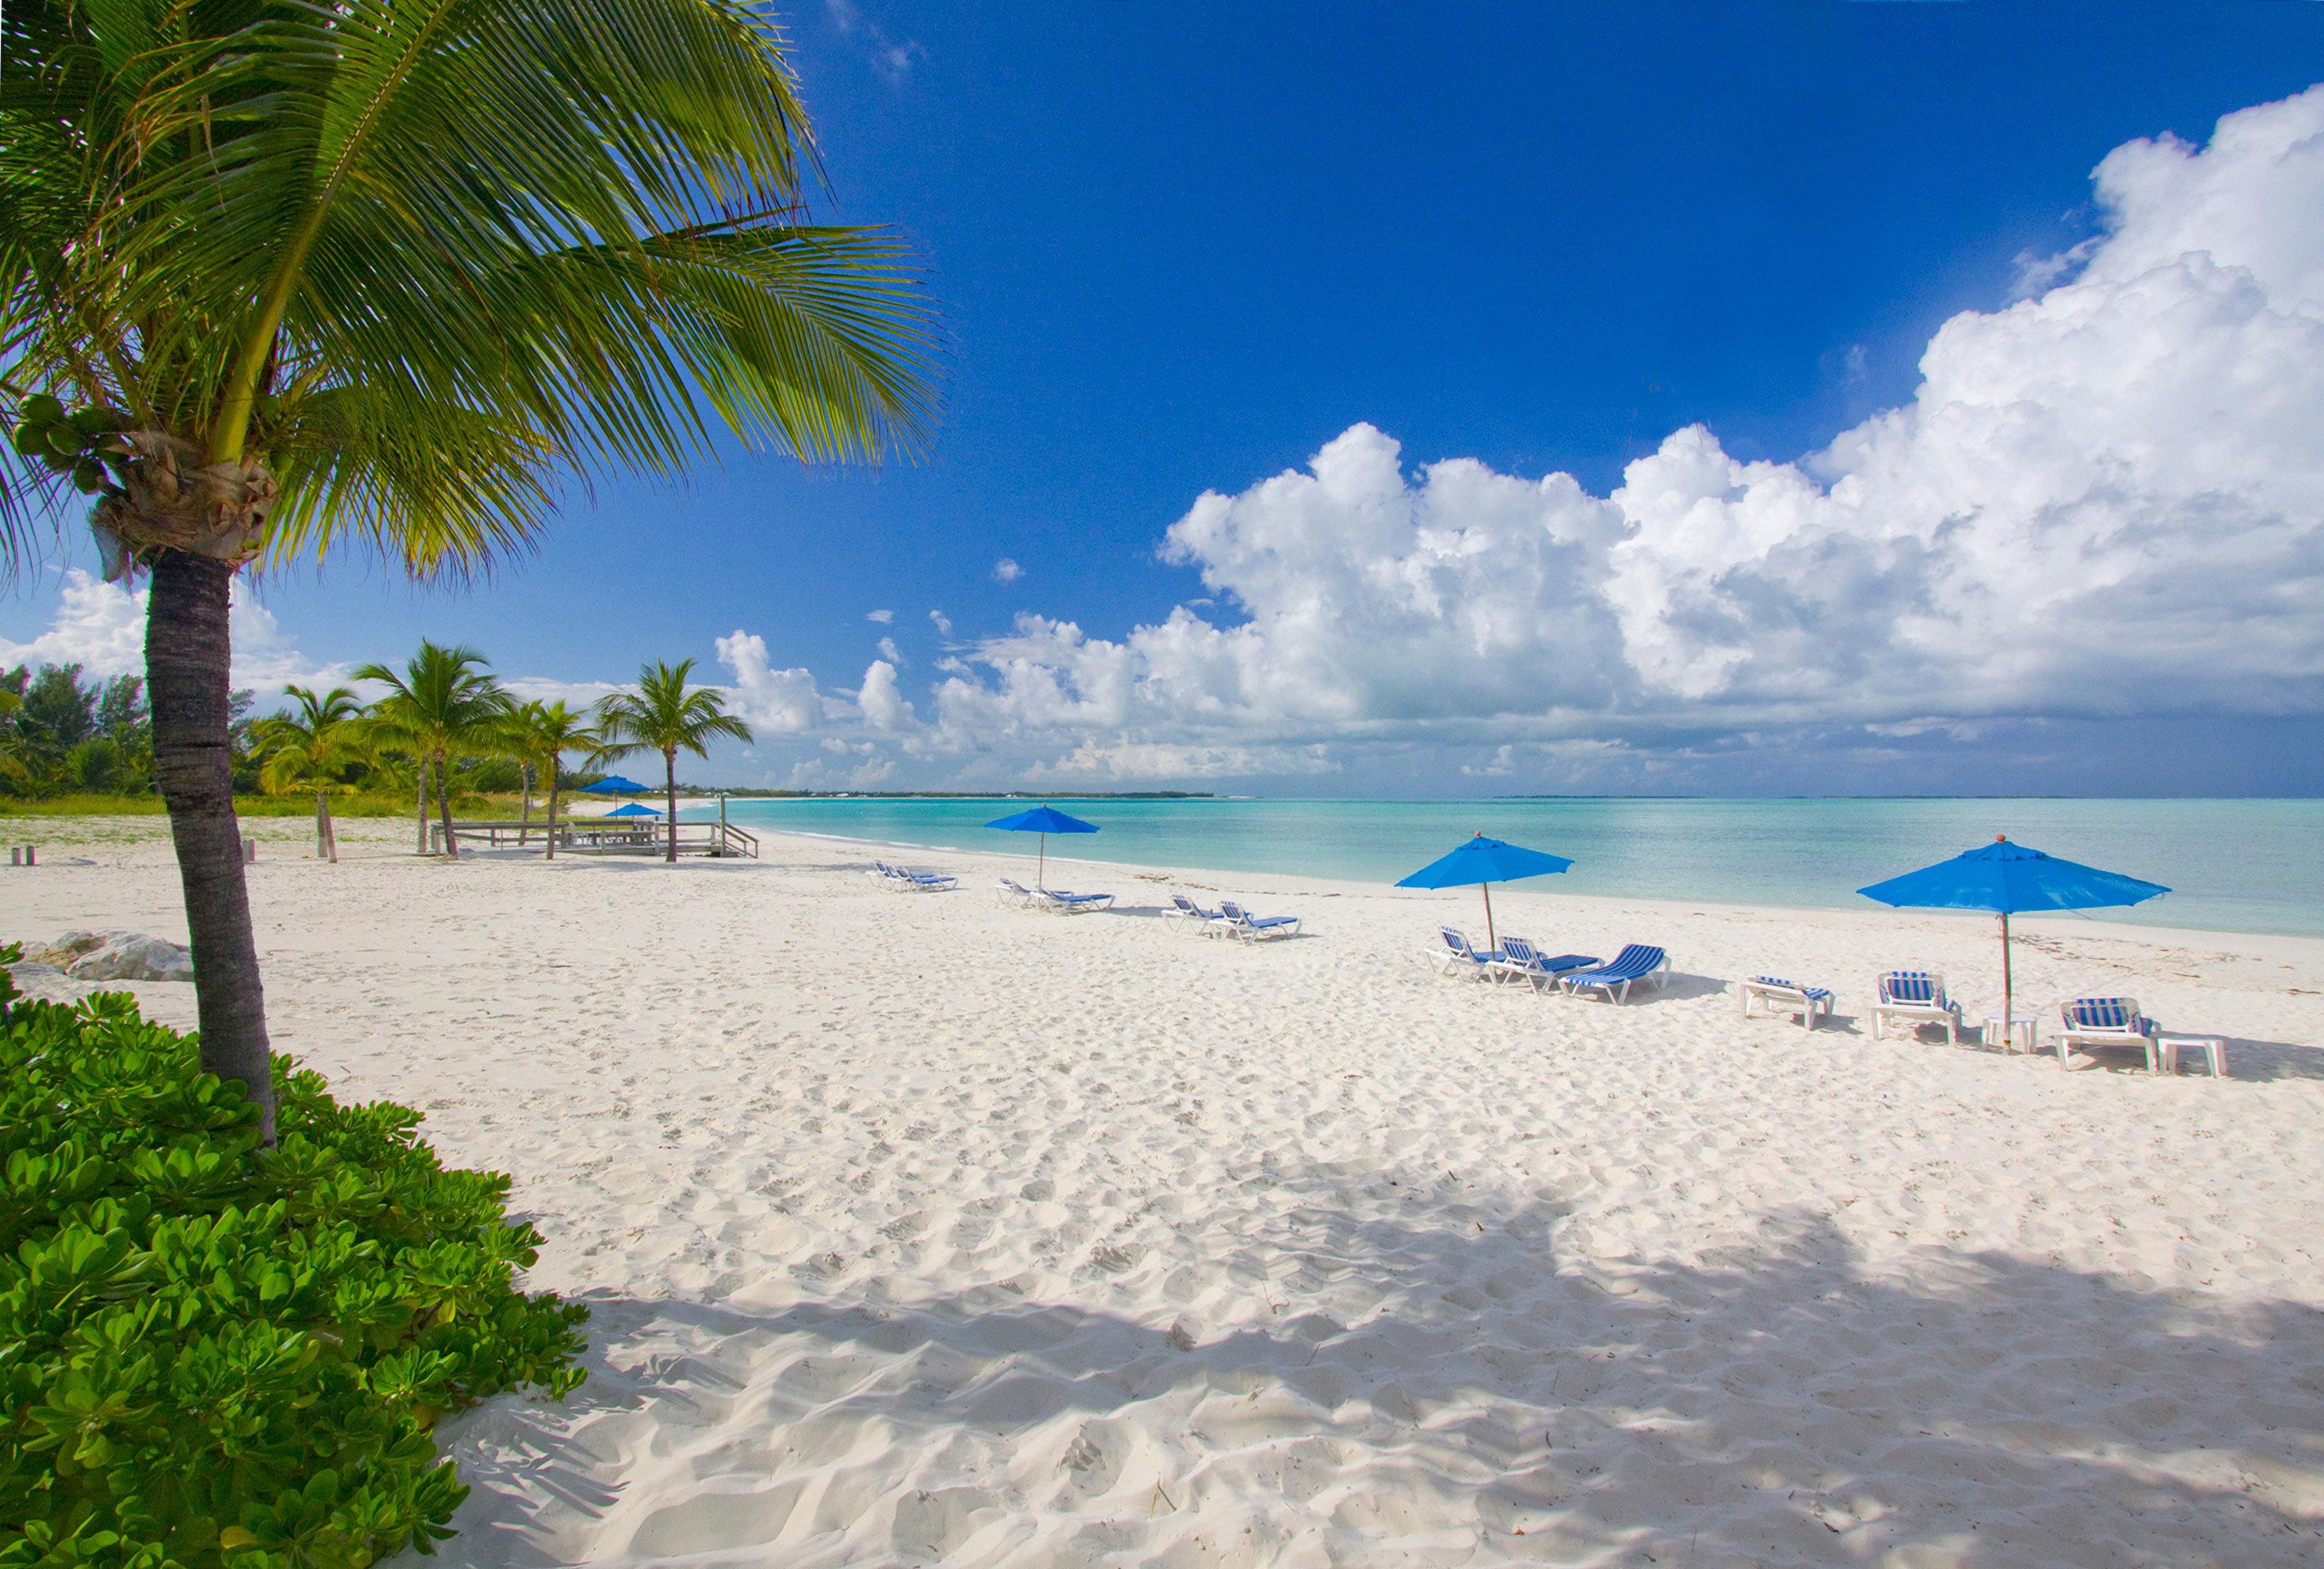 Beach Beachfront Grounds Play Resort sky shore Ocean Sea caribbean Nature Coast palm tropics Lagoon arecales Island cape sand day shade sandy